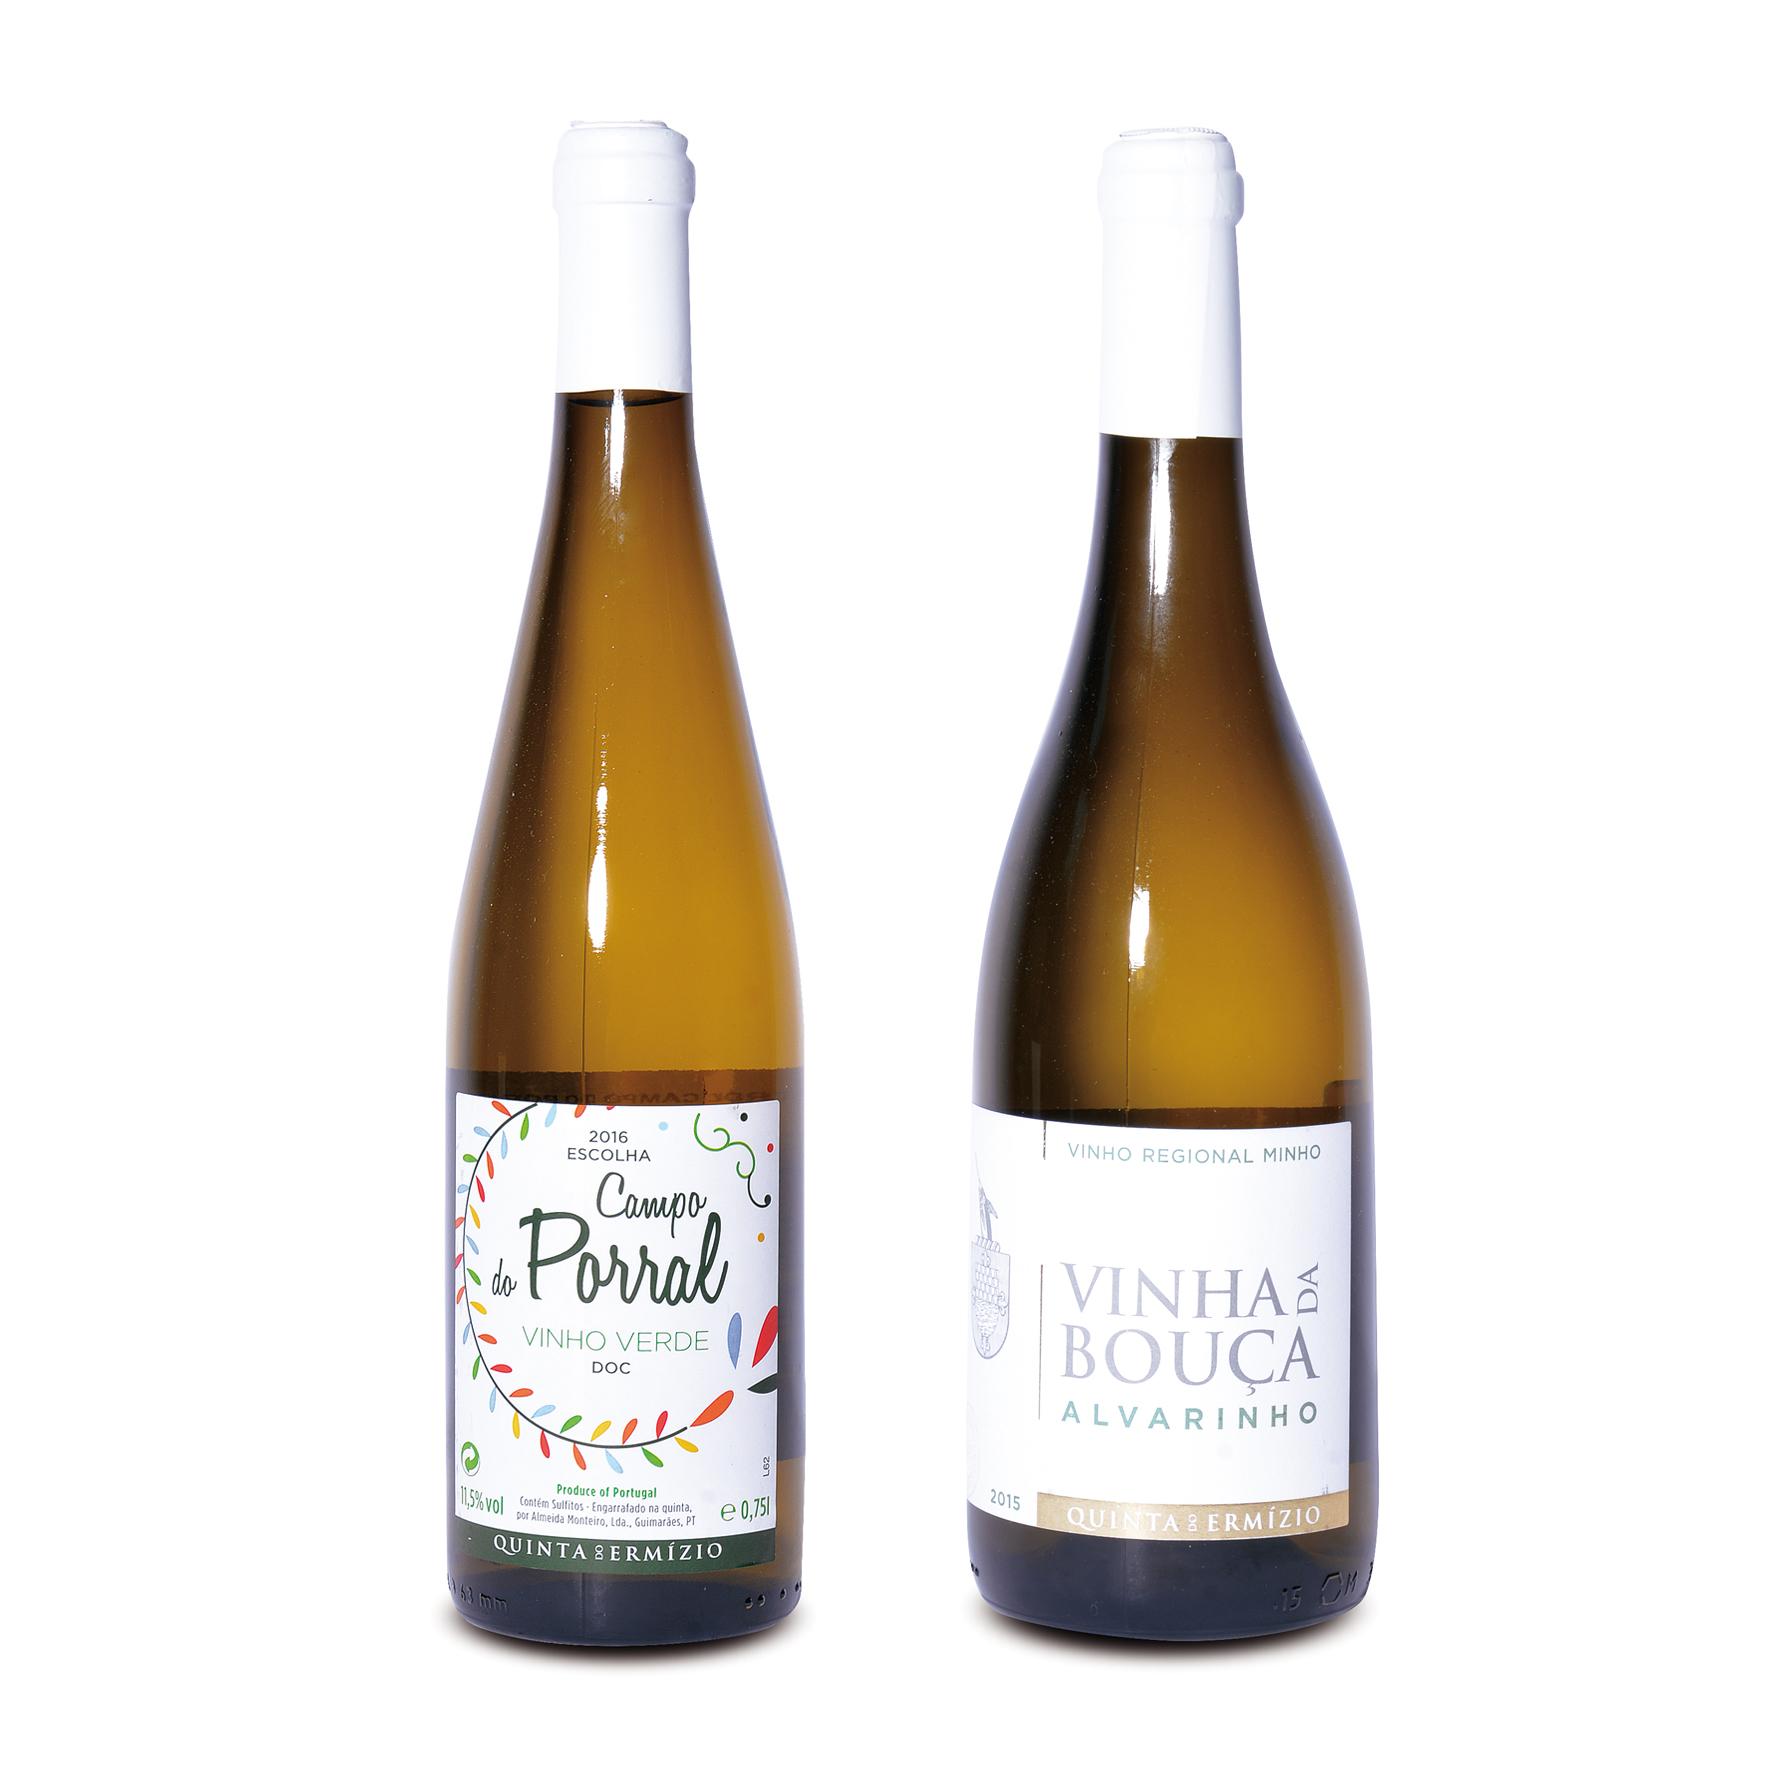 Portugalské vinho verde